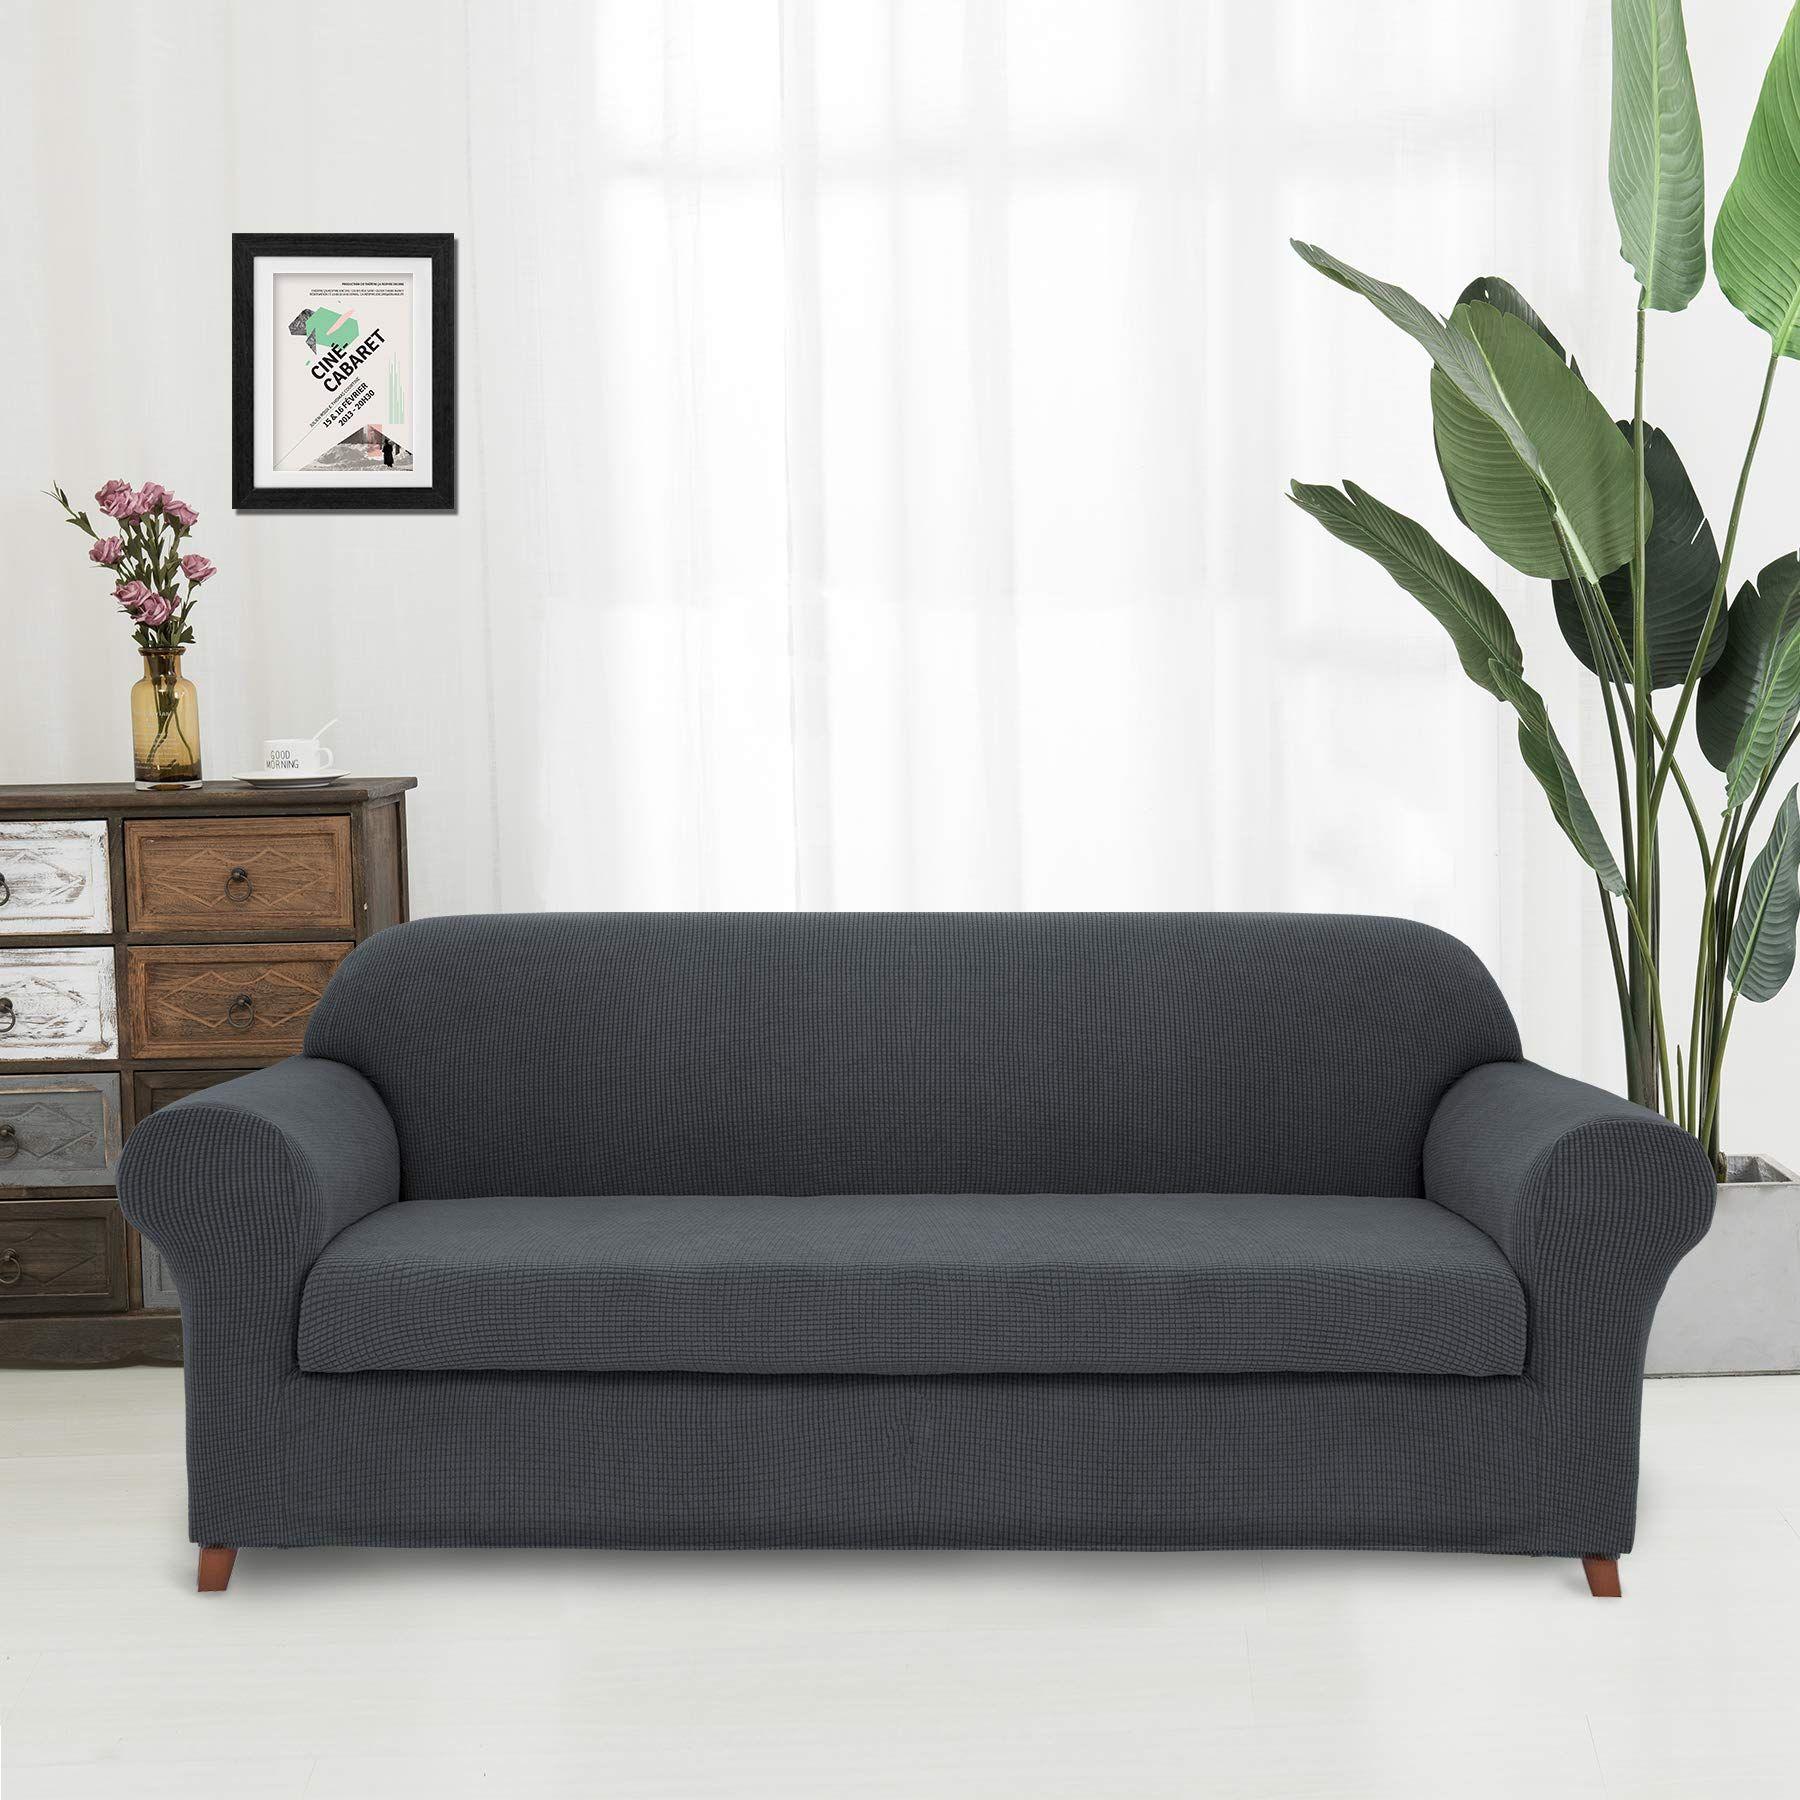 Hokway 2piece Stretch Sofa Slipcover Spandex Couch Cover Antislip